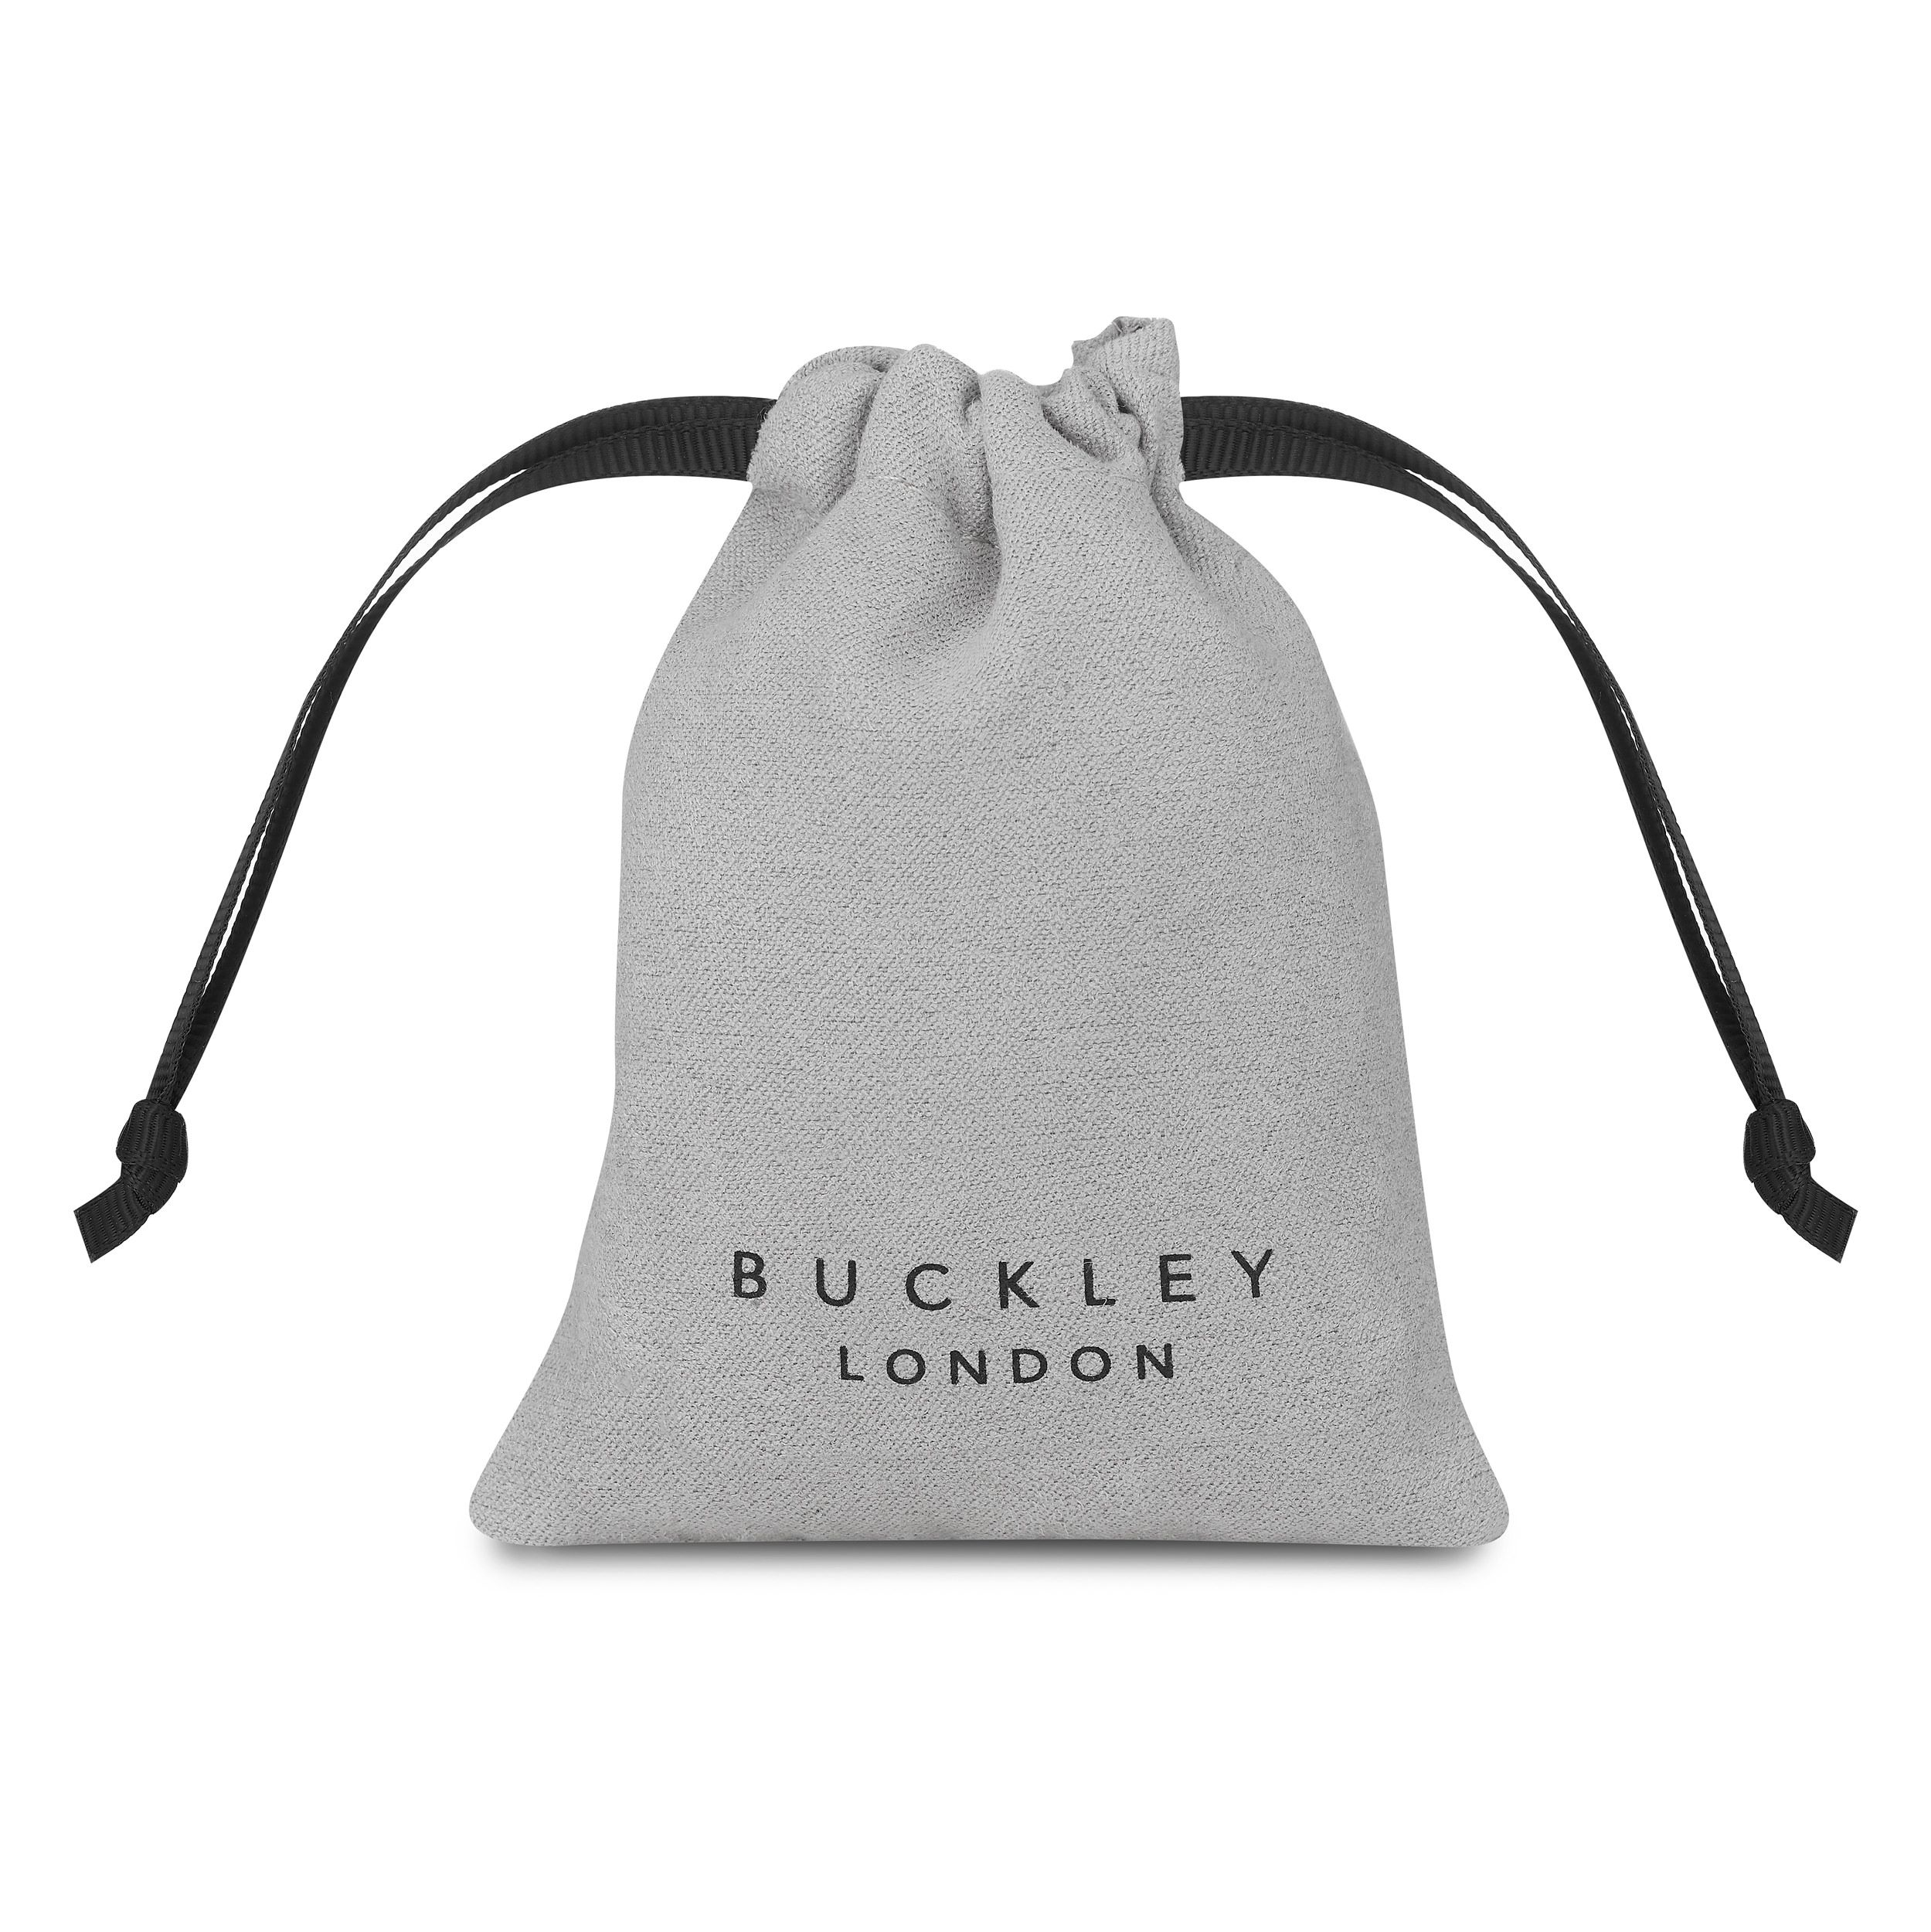 Buckley London Bamboo Bracelet - Rose Gold Bag